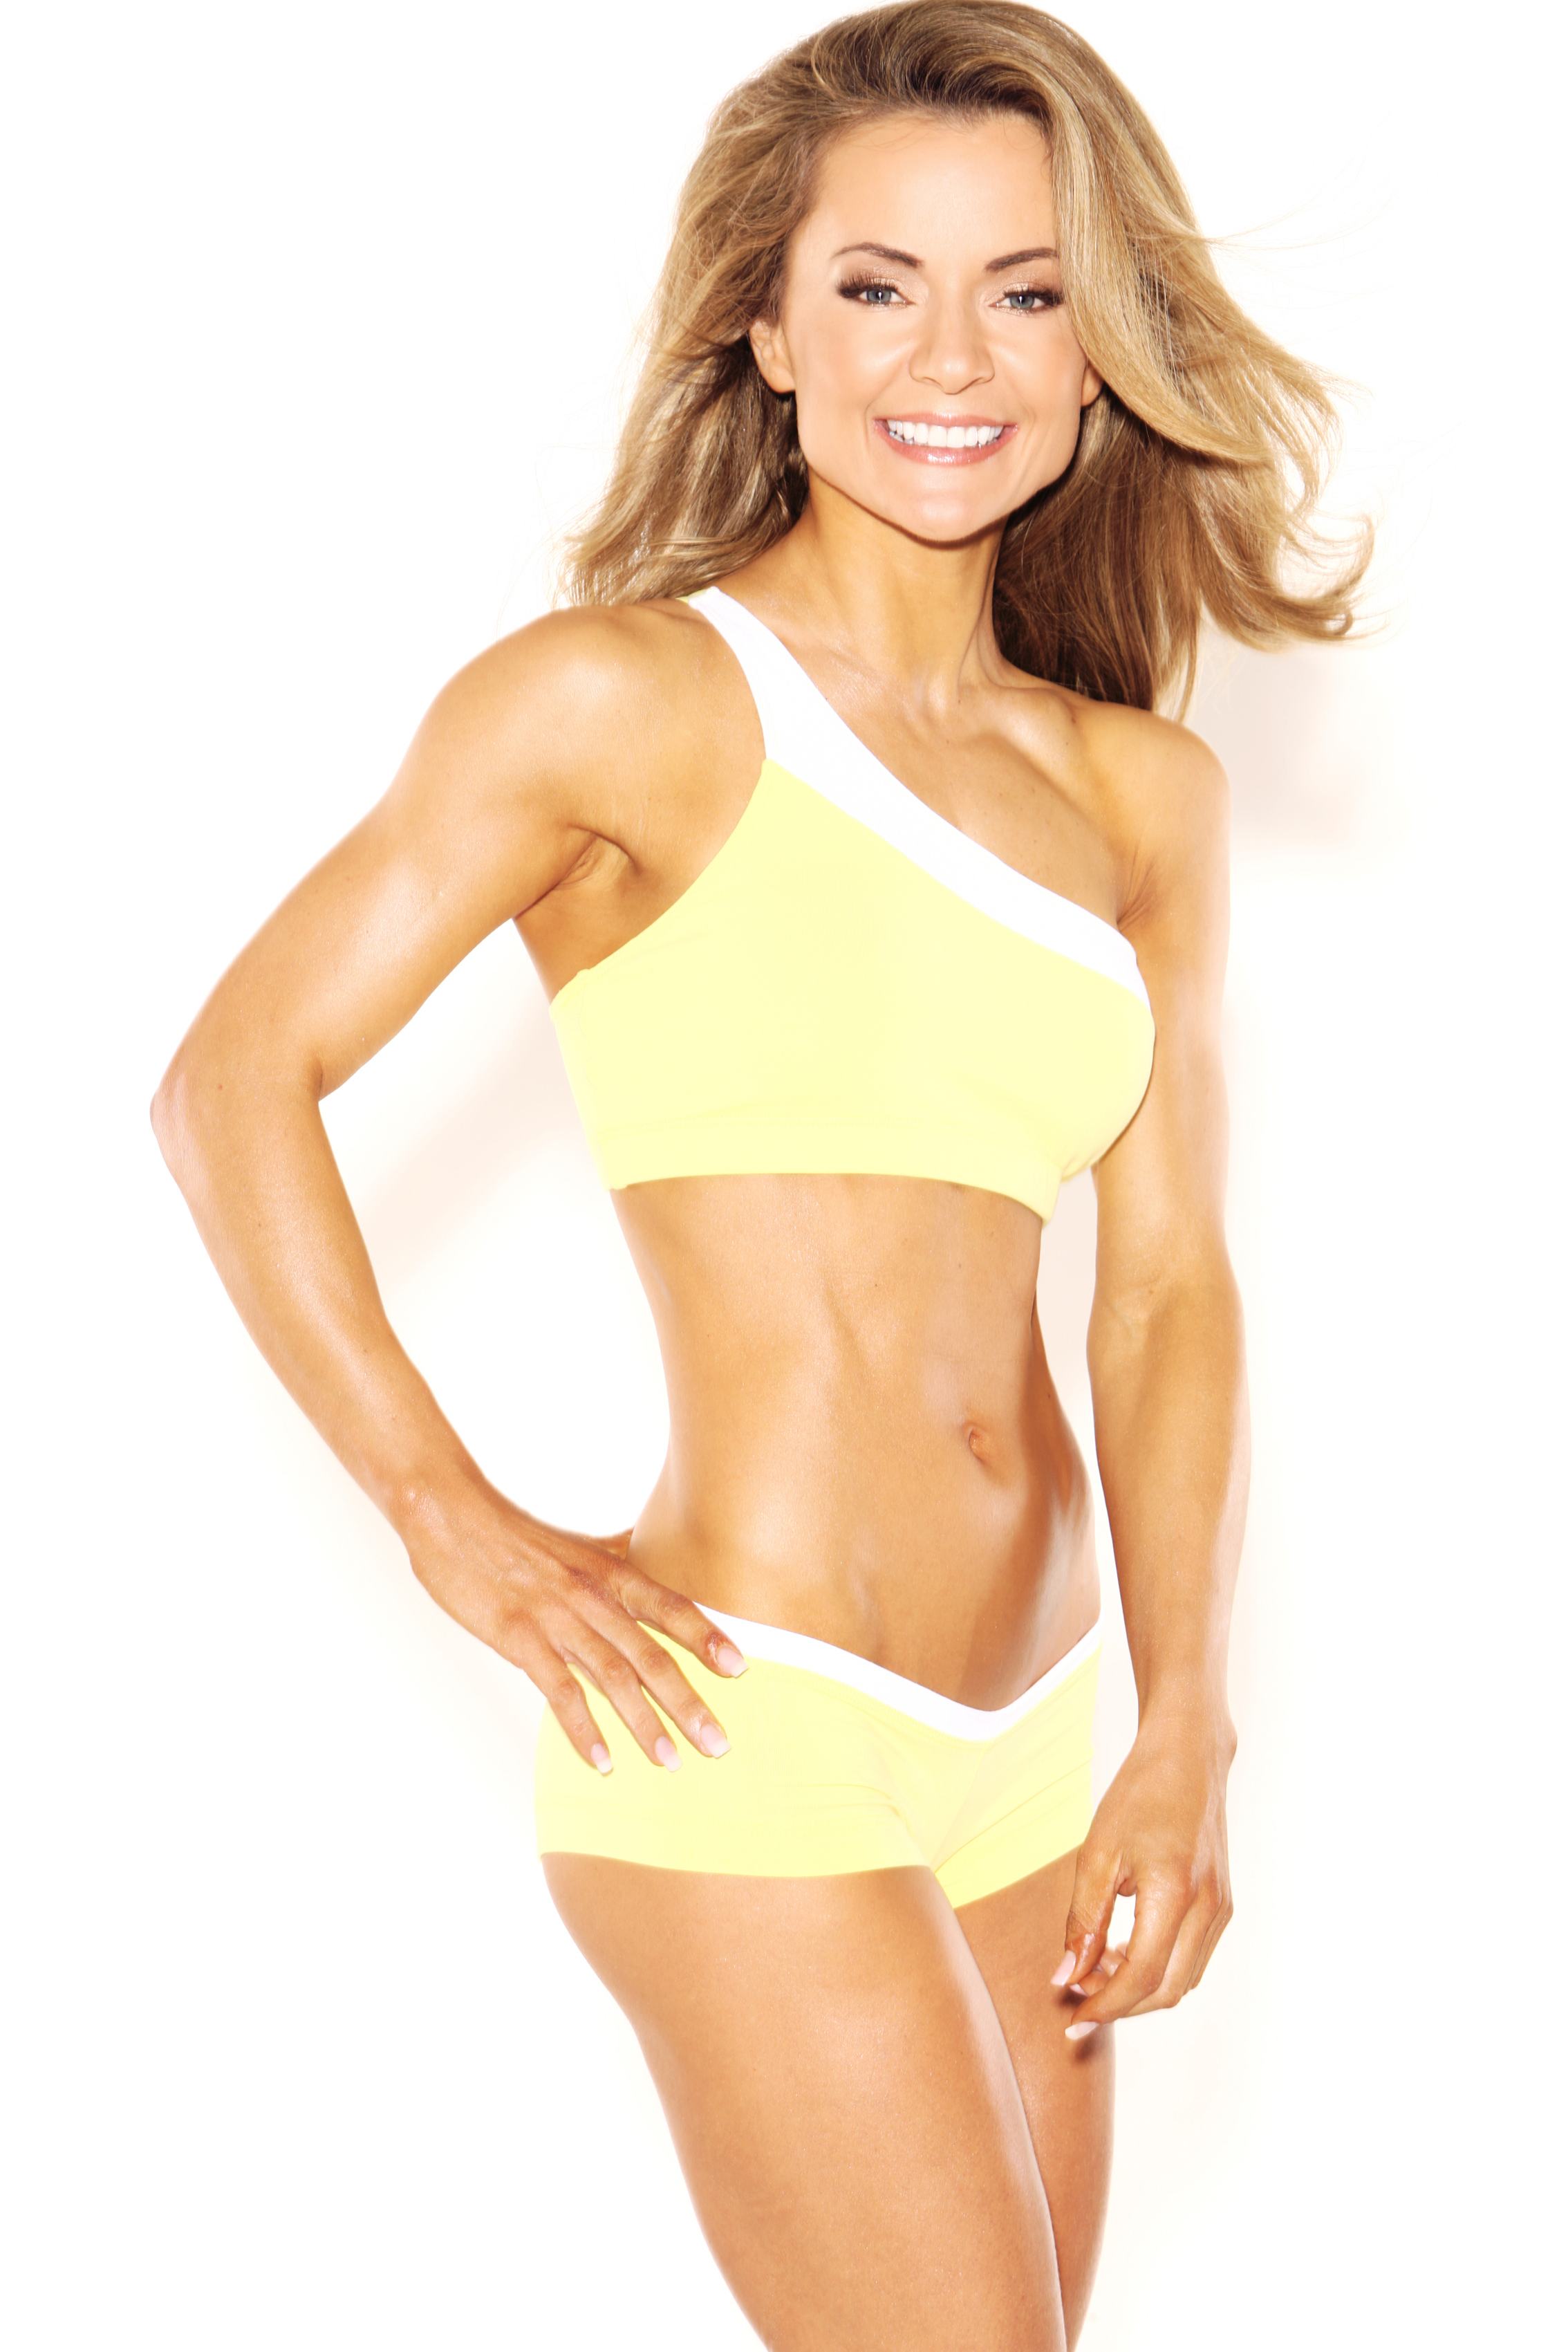 International Fitness Expert Alexandra Wilson Launches First Of Its